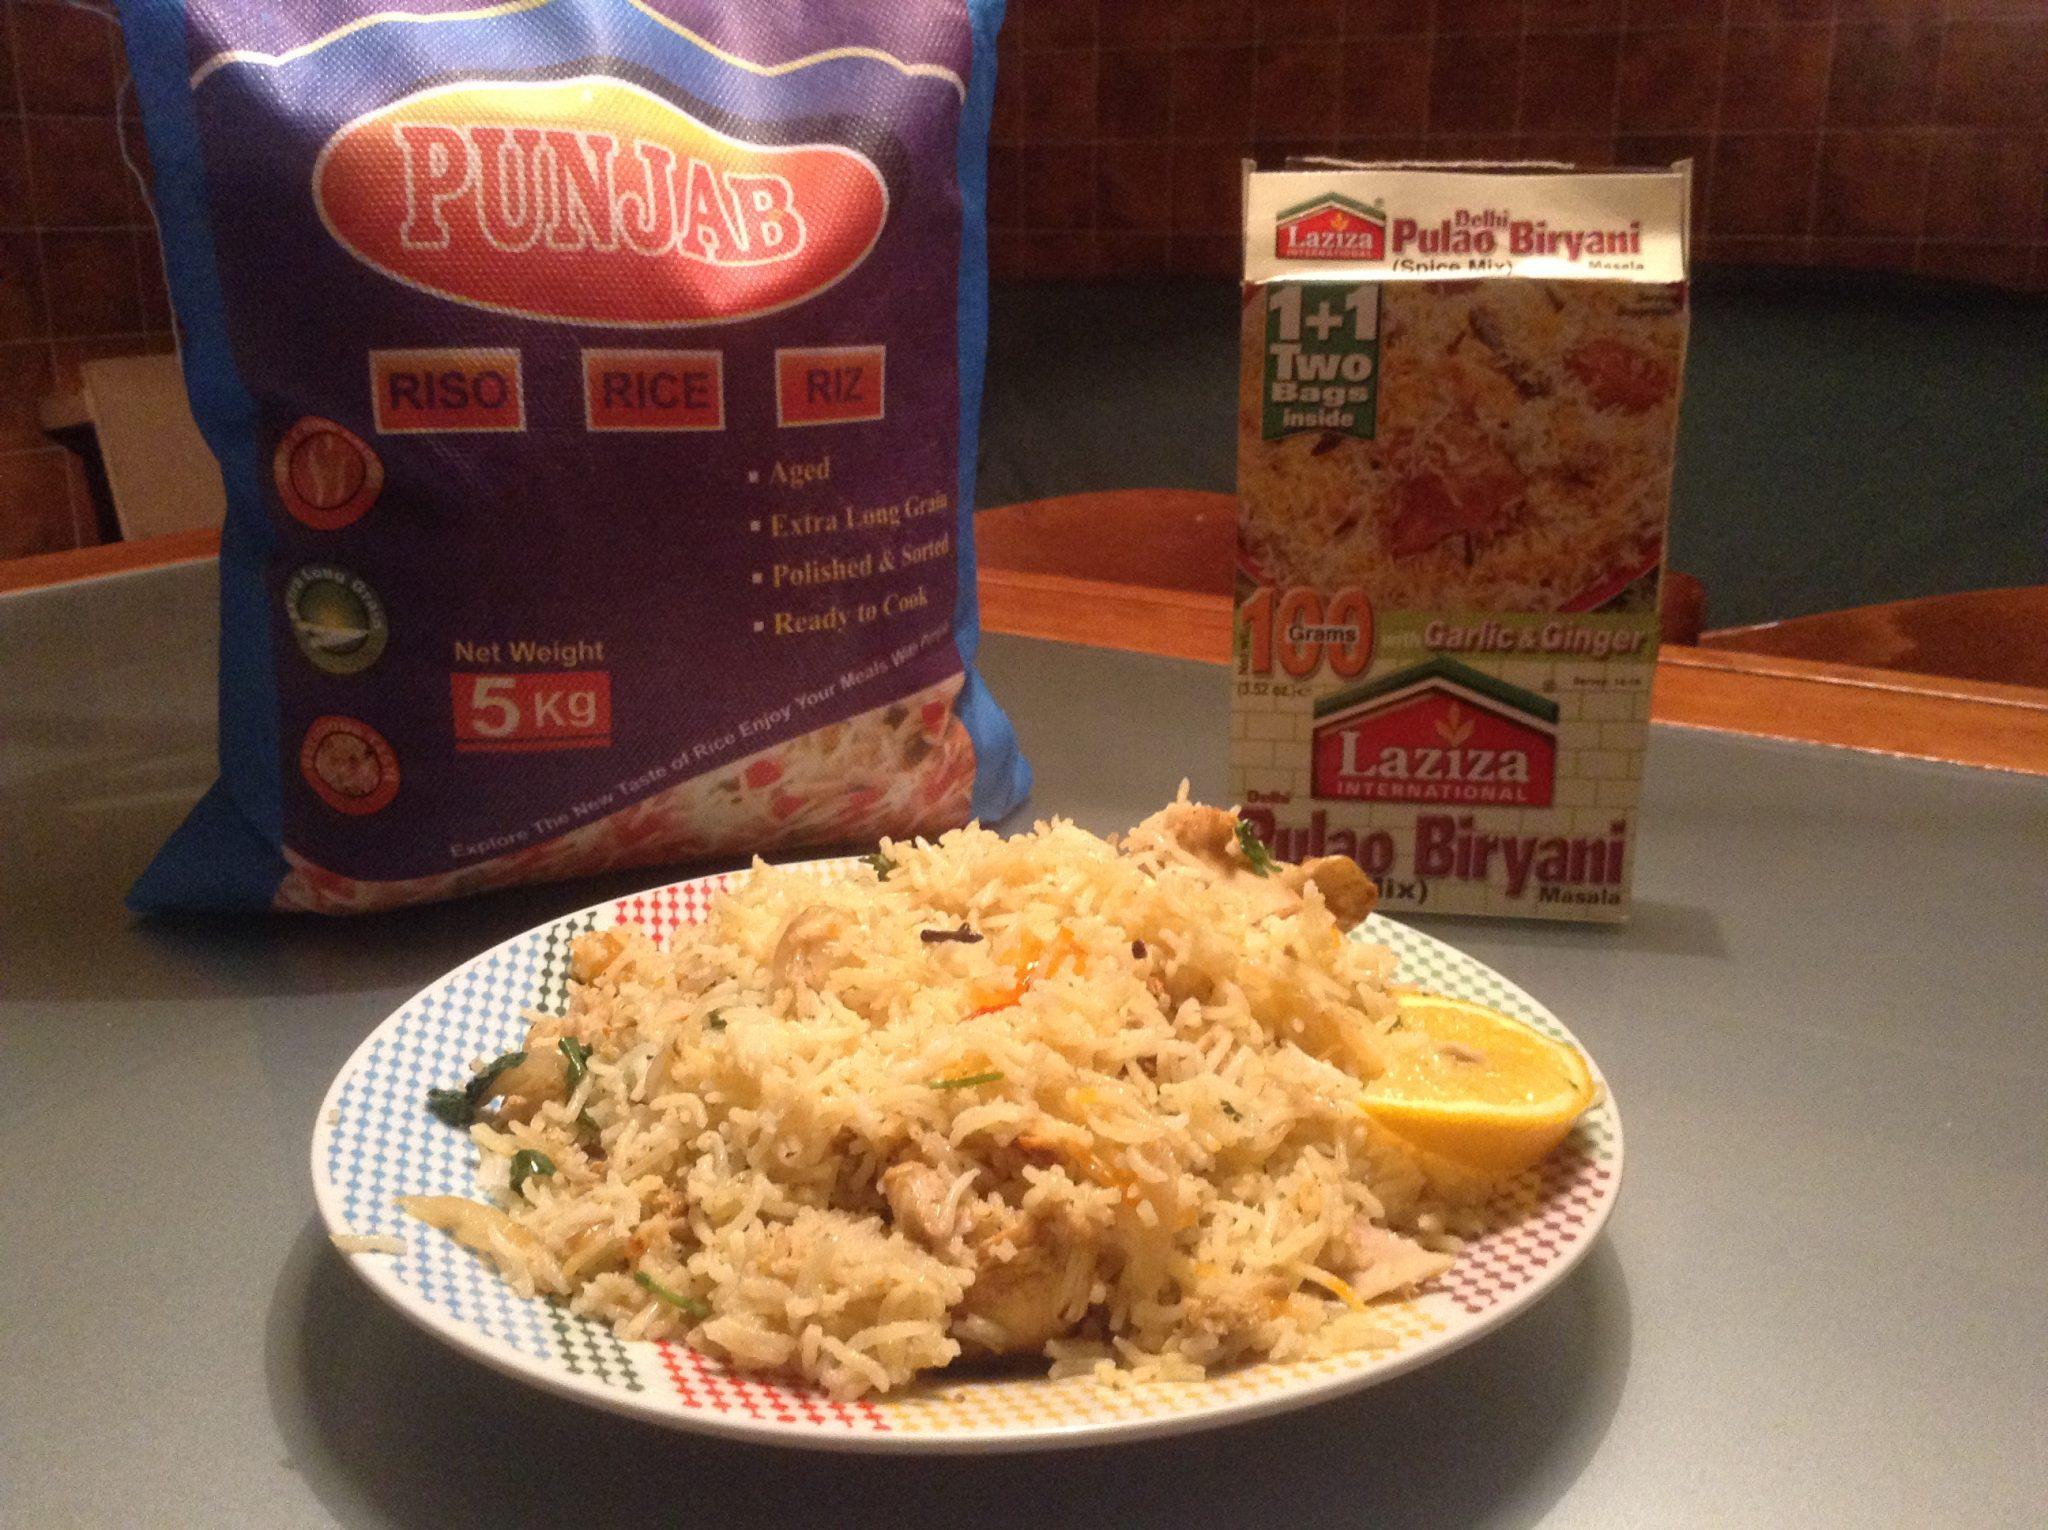 Biryani: The most addictive food in the world